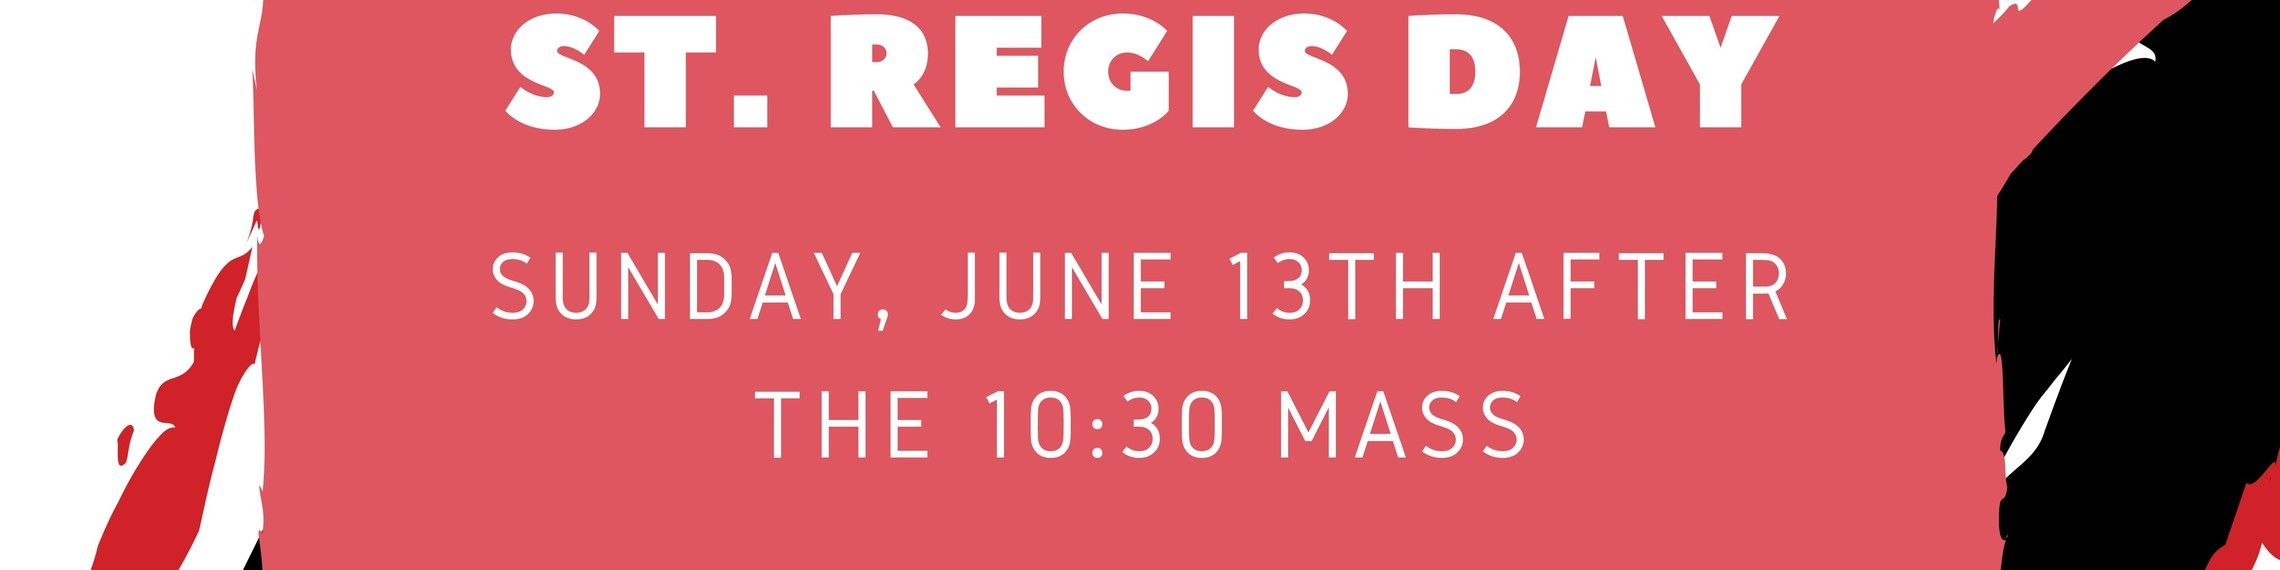 St. Regis Day 2021